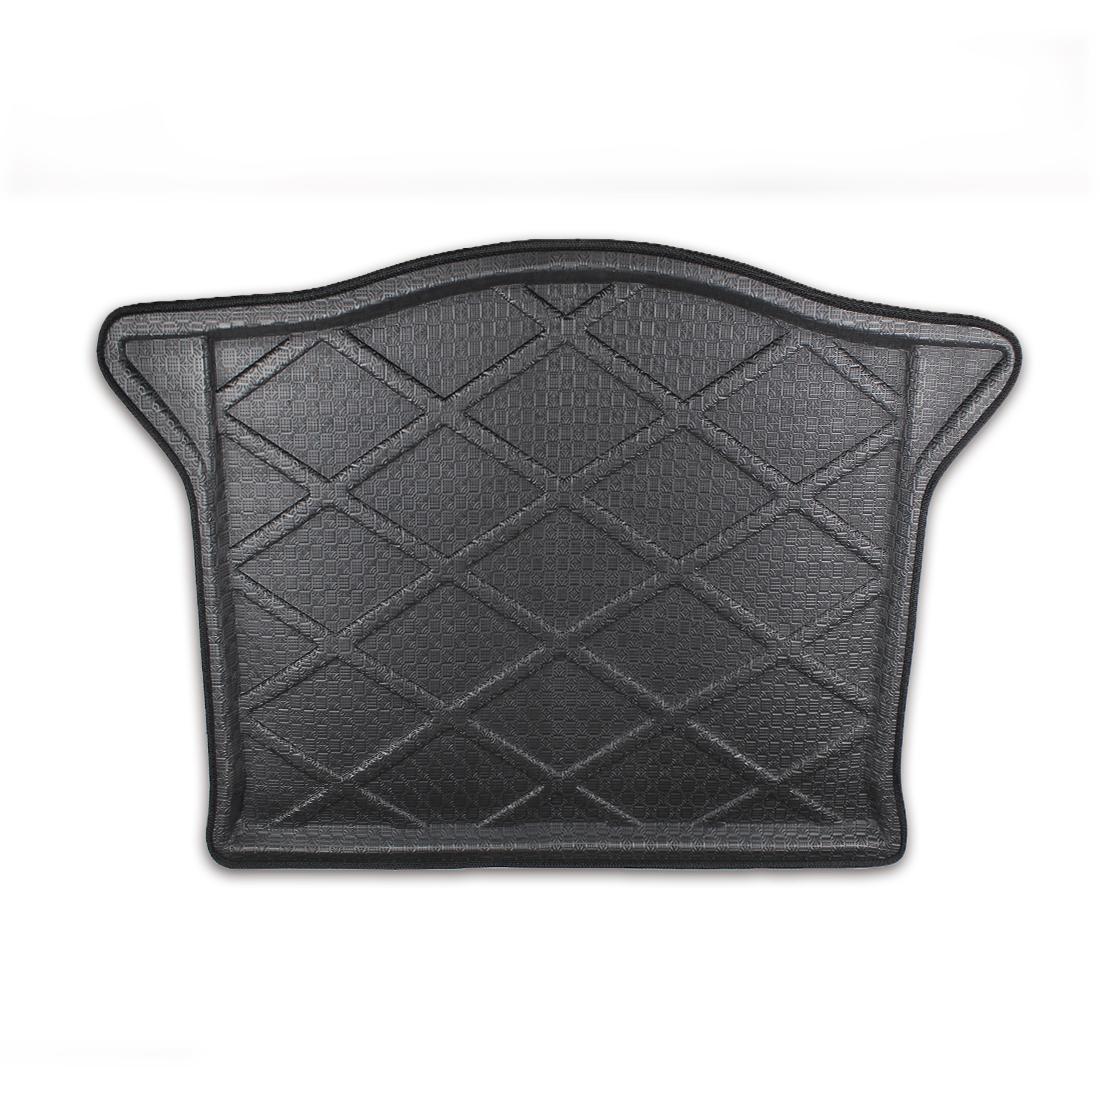 Black Rubber Cargo Floor Mat Waterproof For Honda Fit Jazz 08 15 Image 1 Zoomed